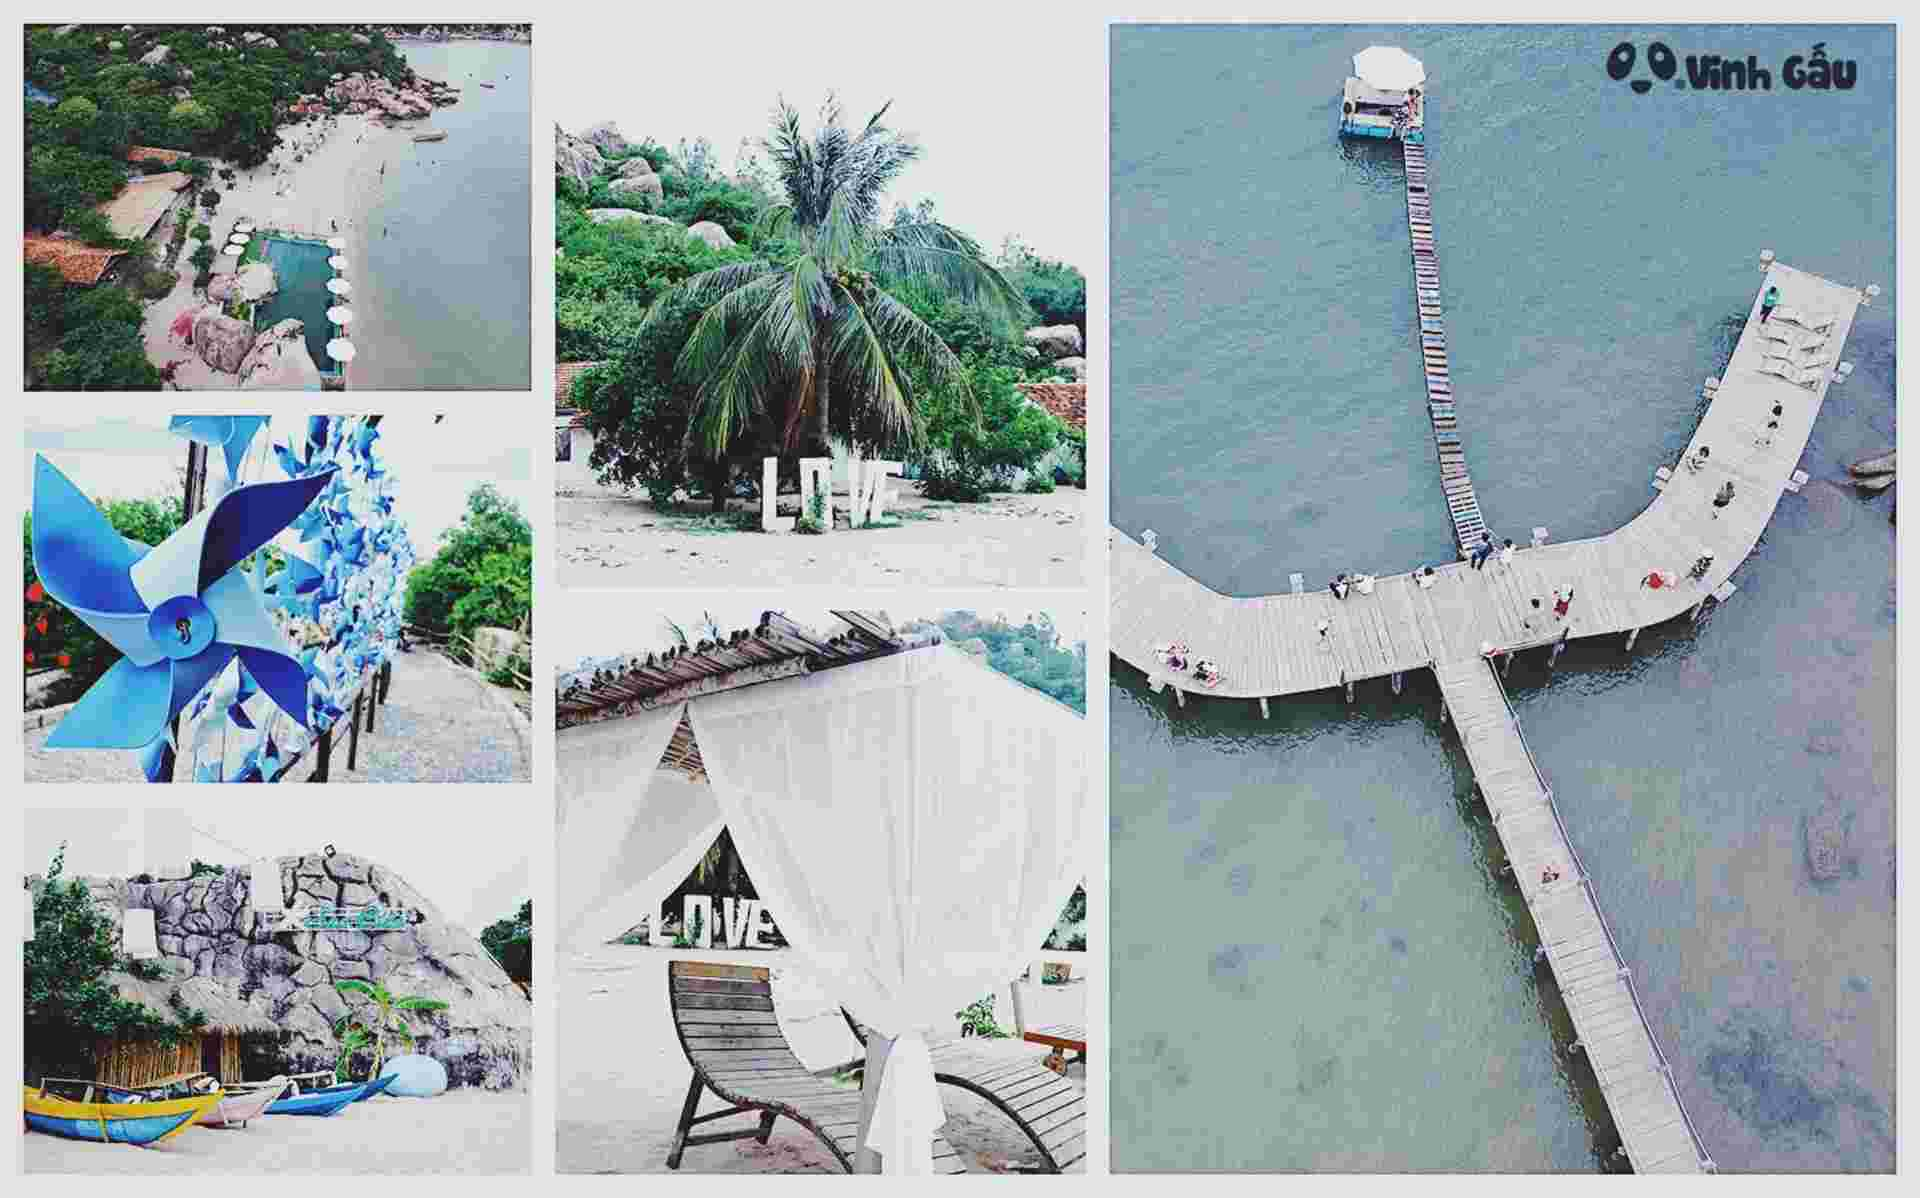 Du lịch sinh thái Sao Biển Cam Ranh (Official)